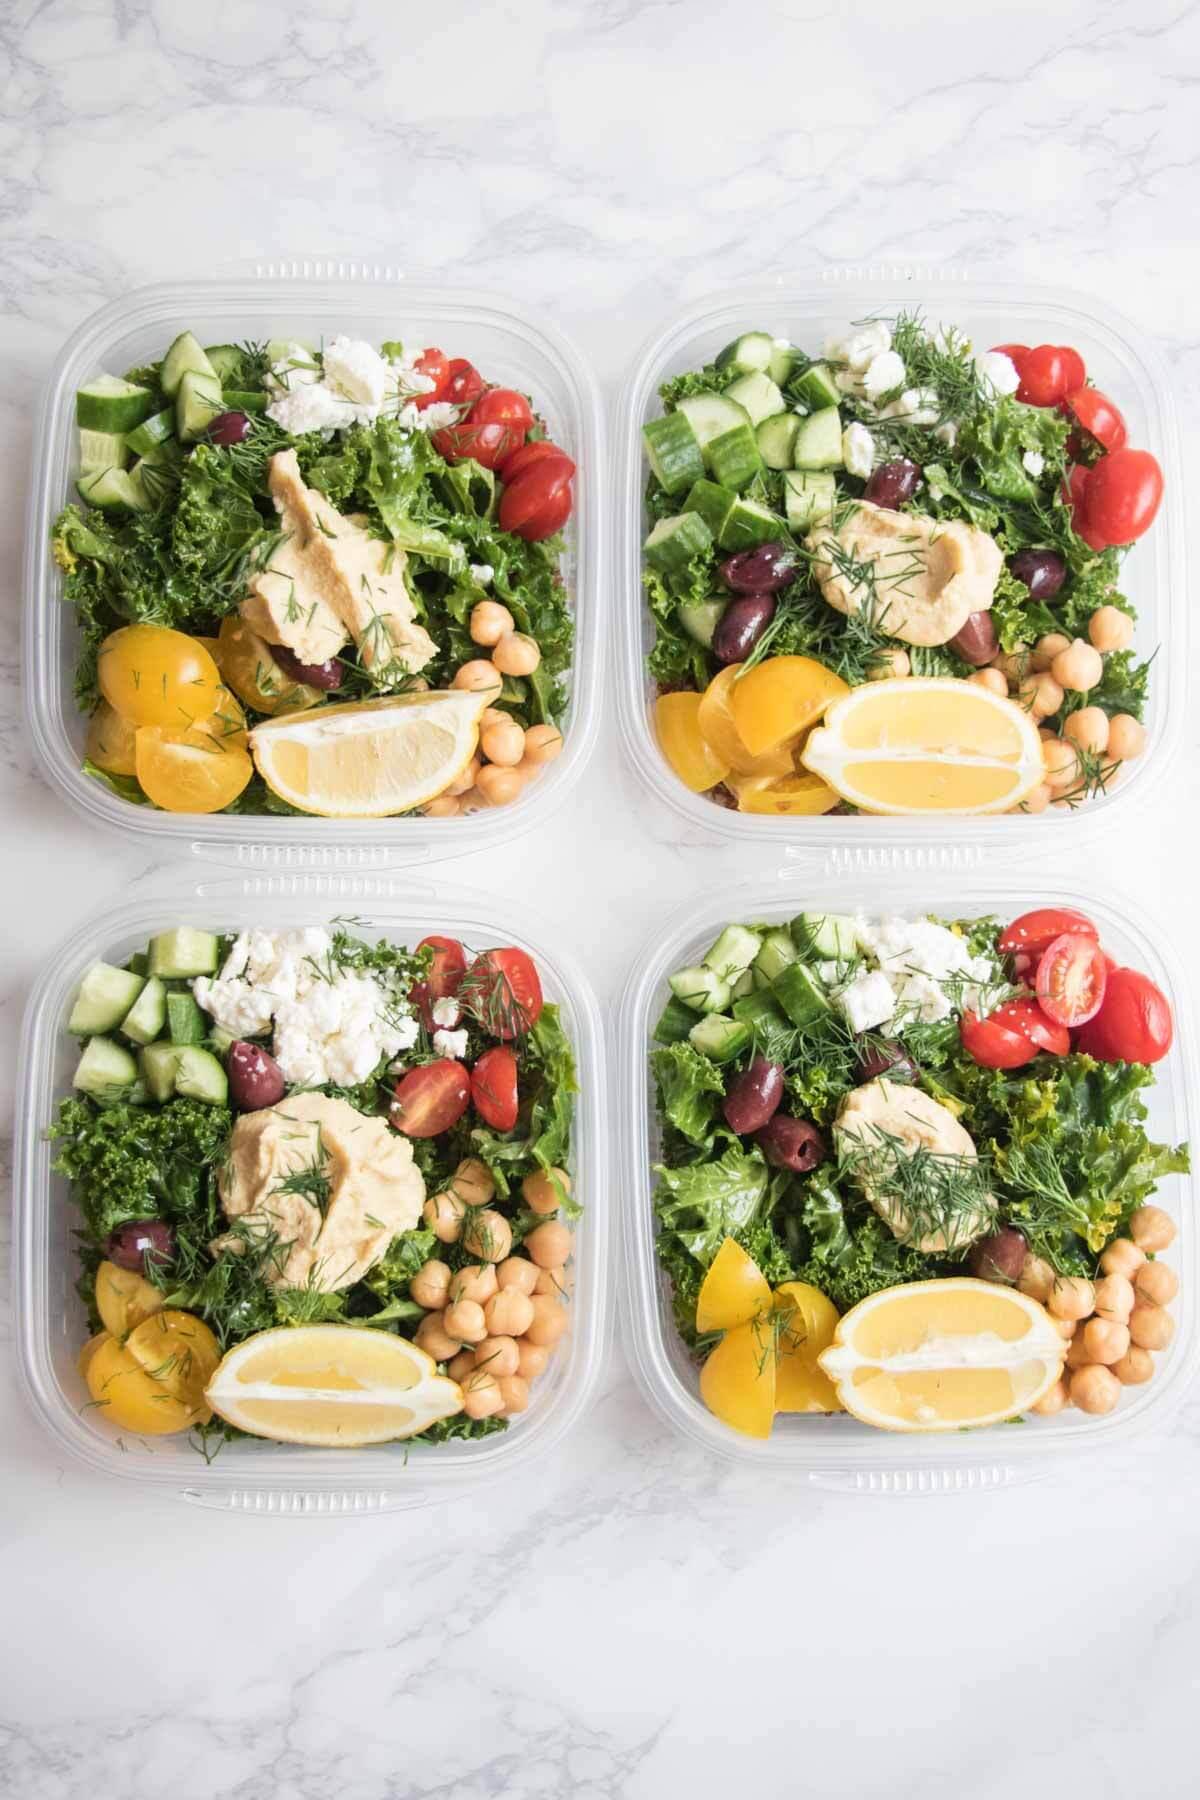 Greek Kale and Quinoa Salad Meal Prep Bowls | Abra's Kitchen